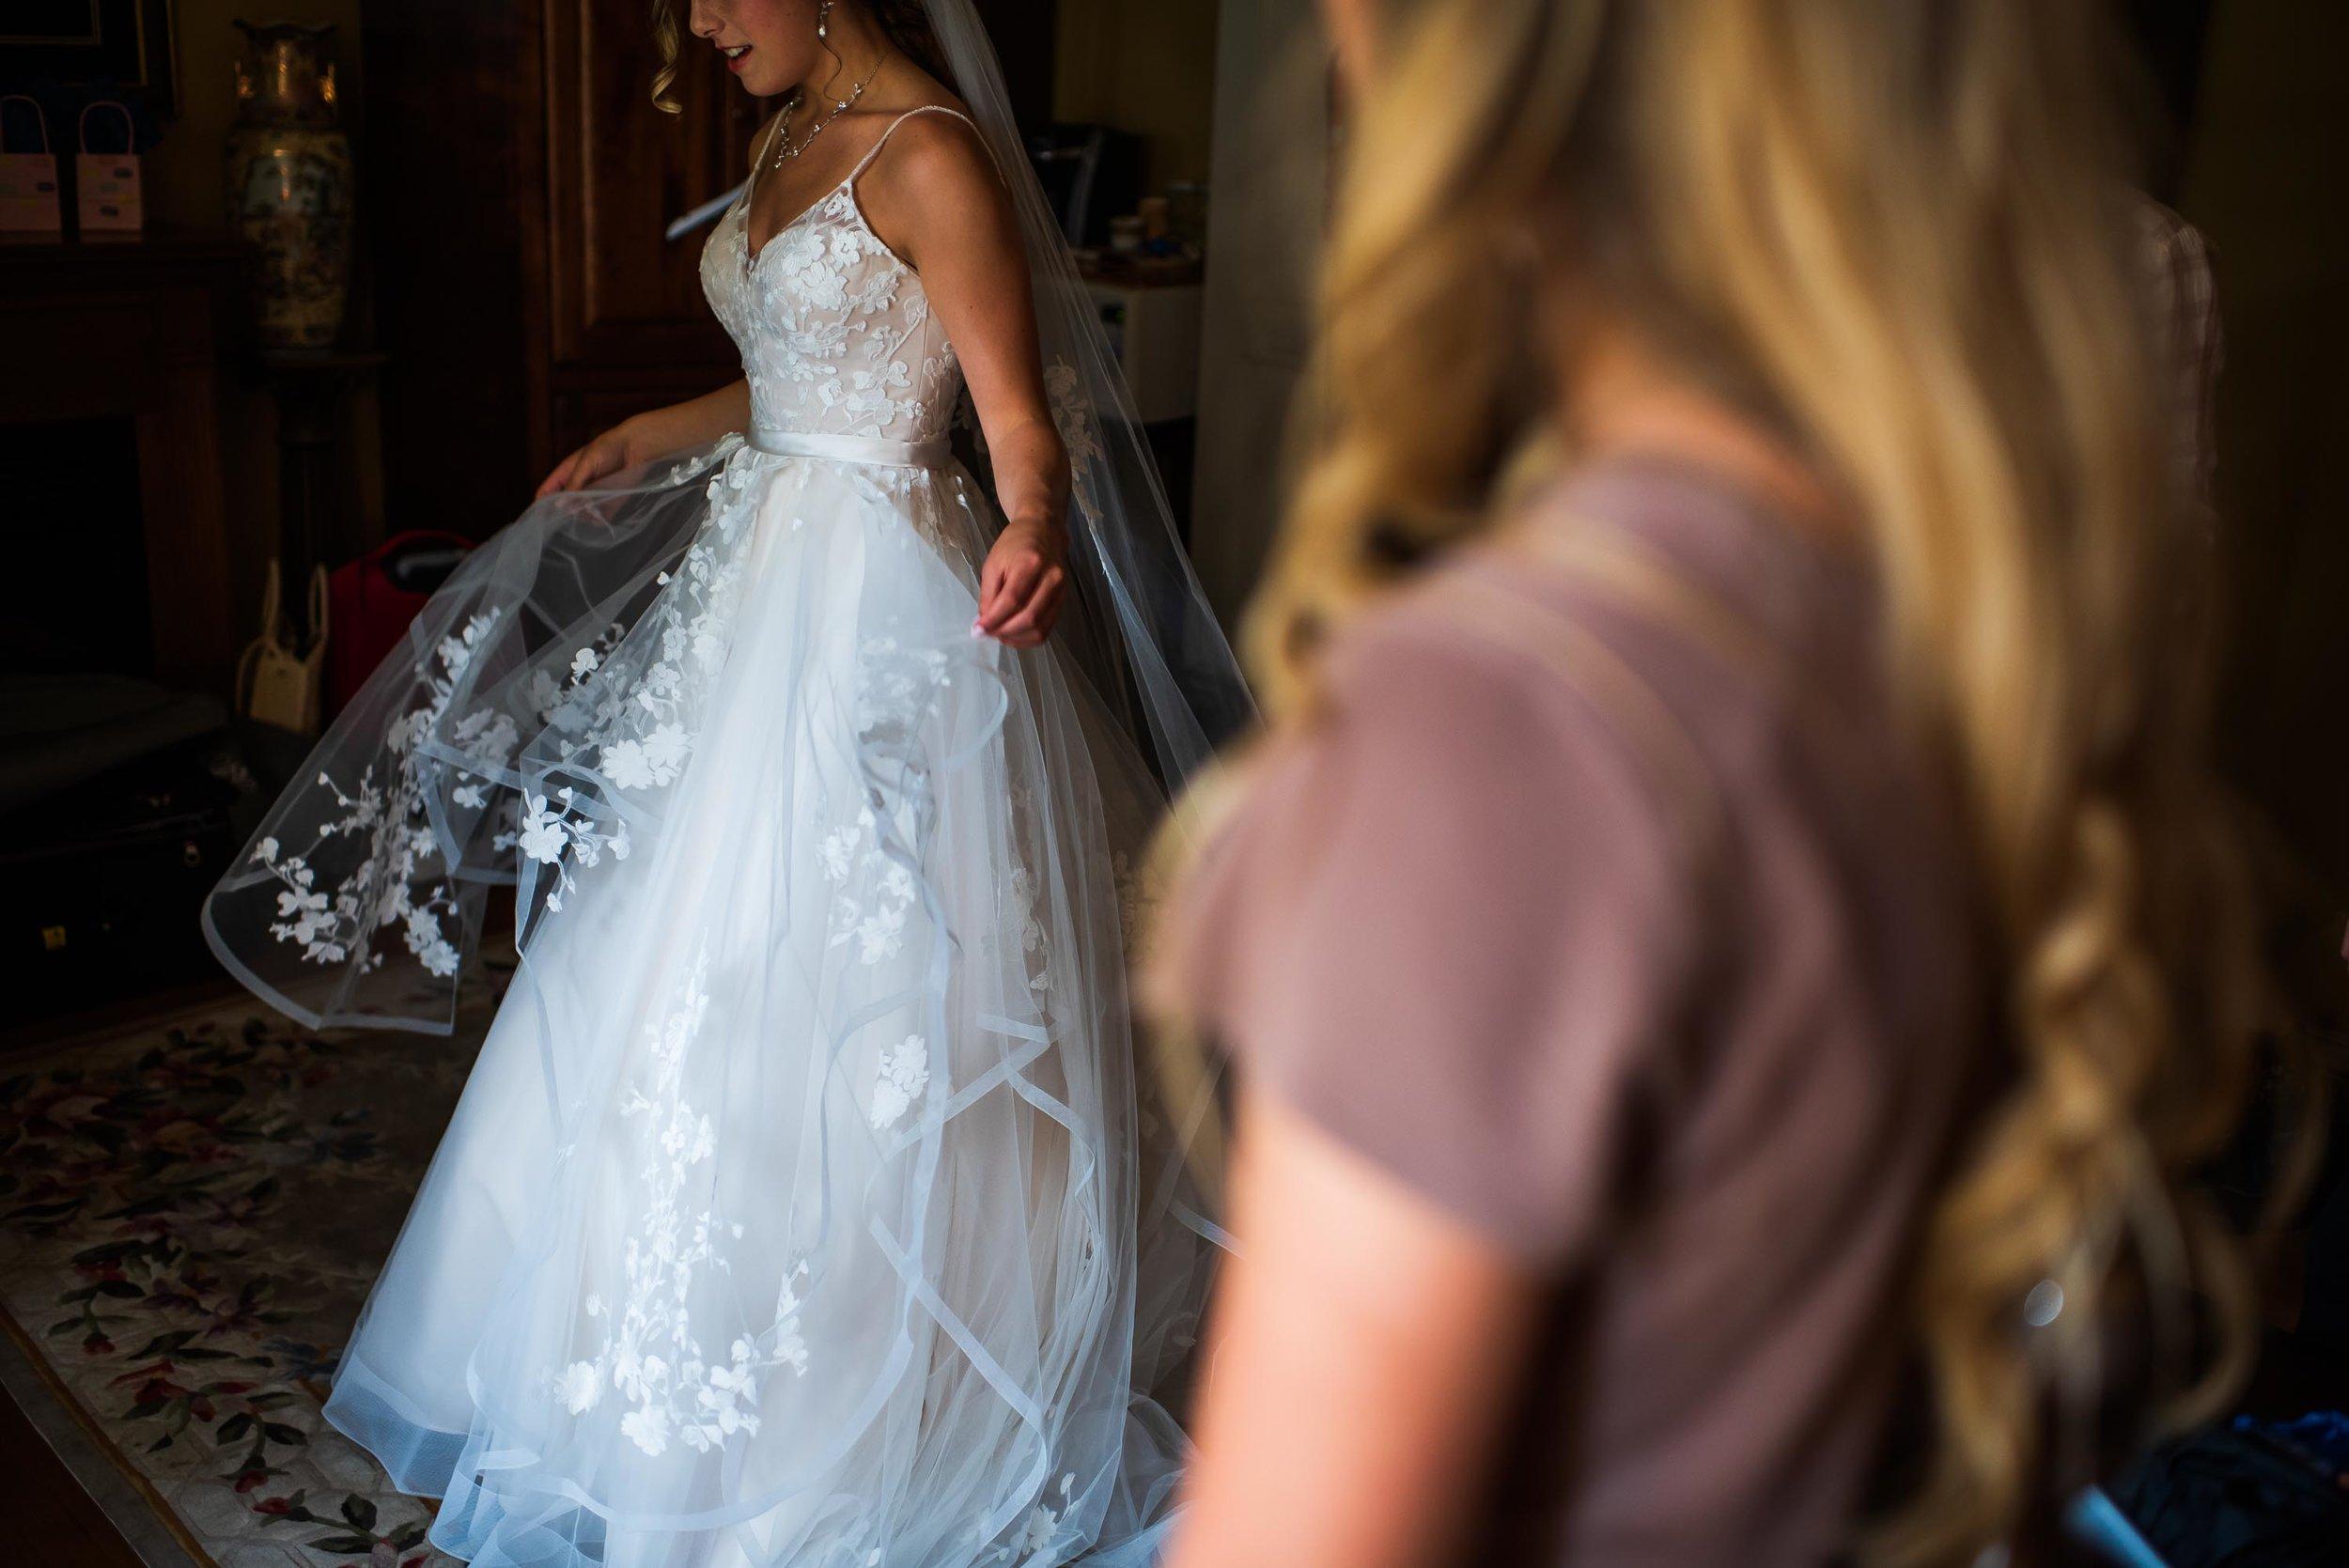 thornewood castle wedding 6.jpg